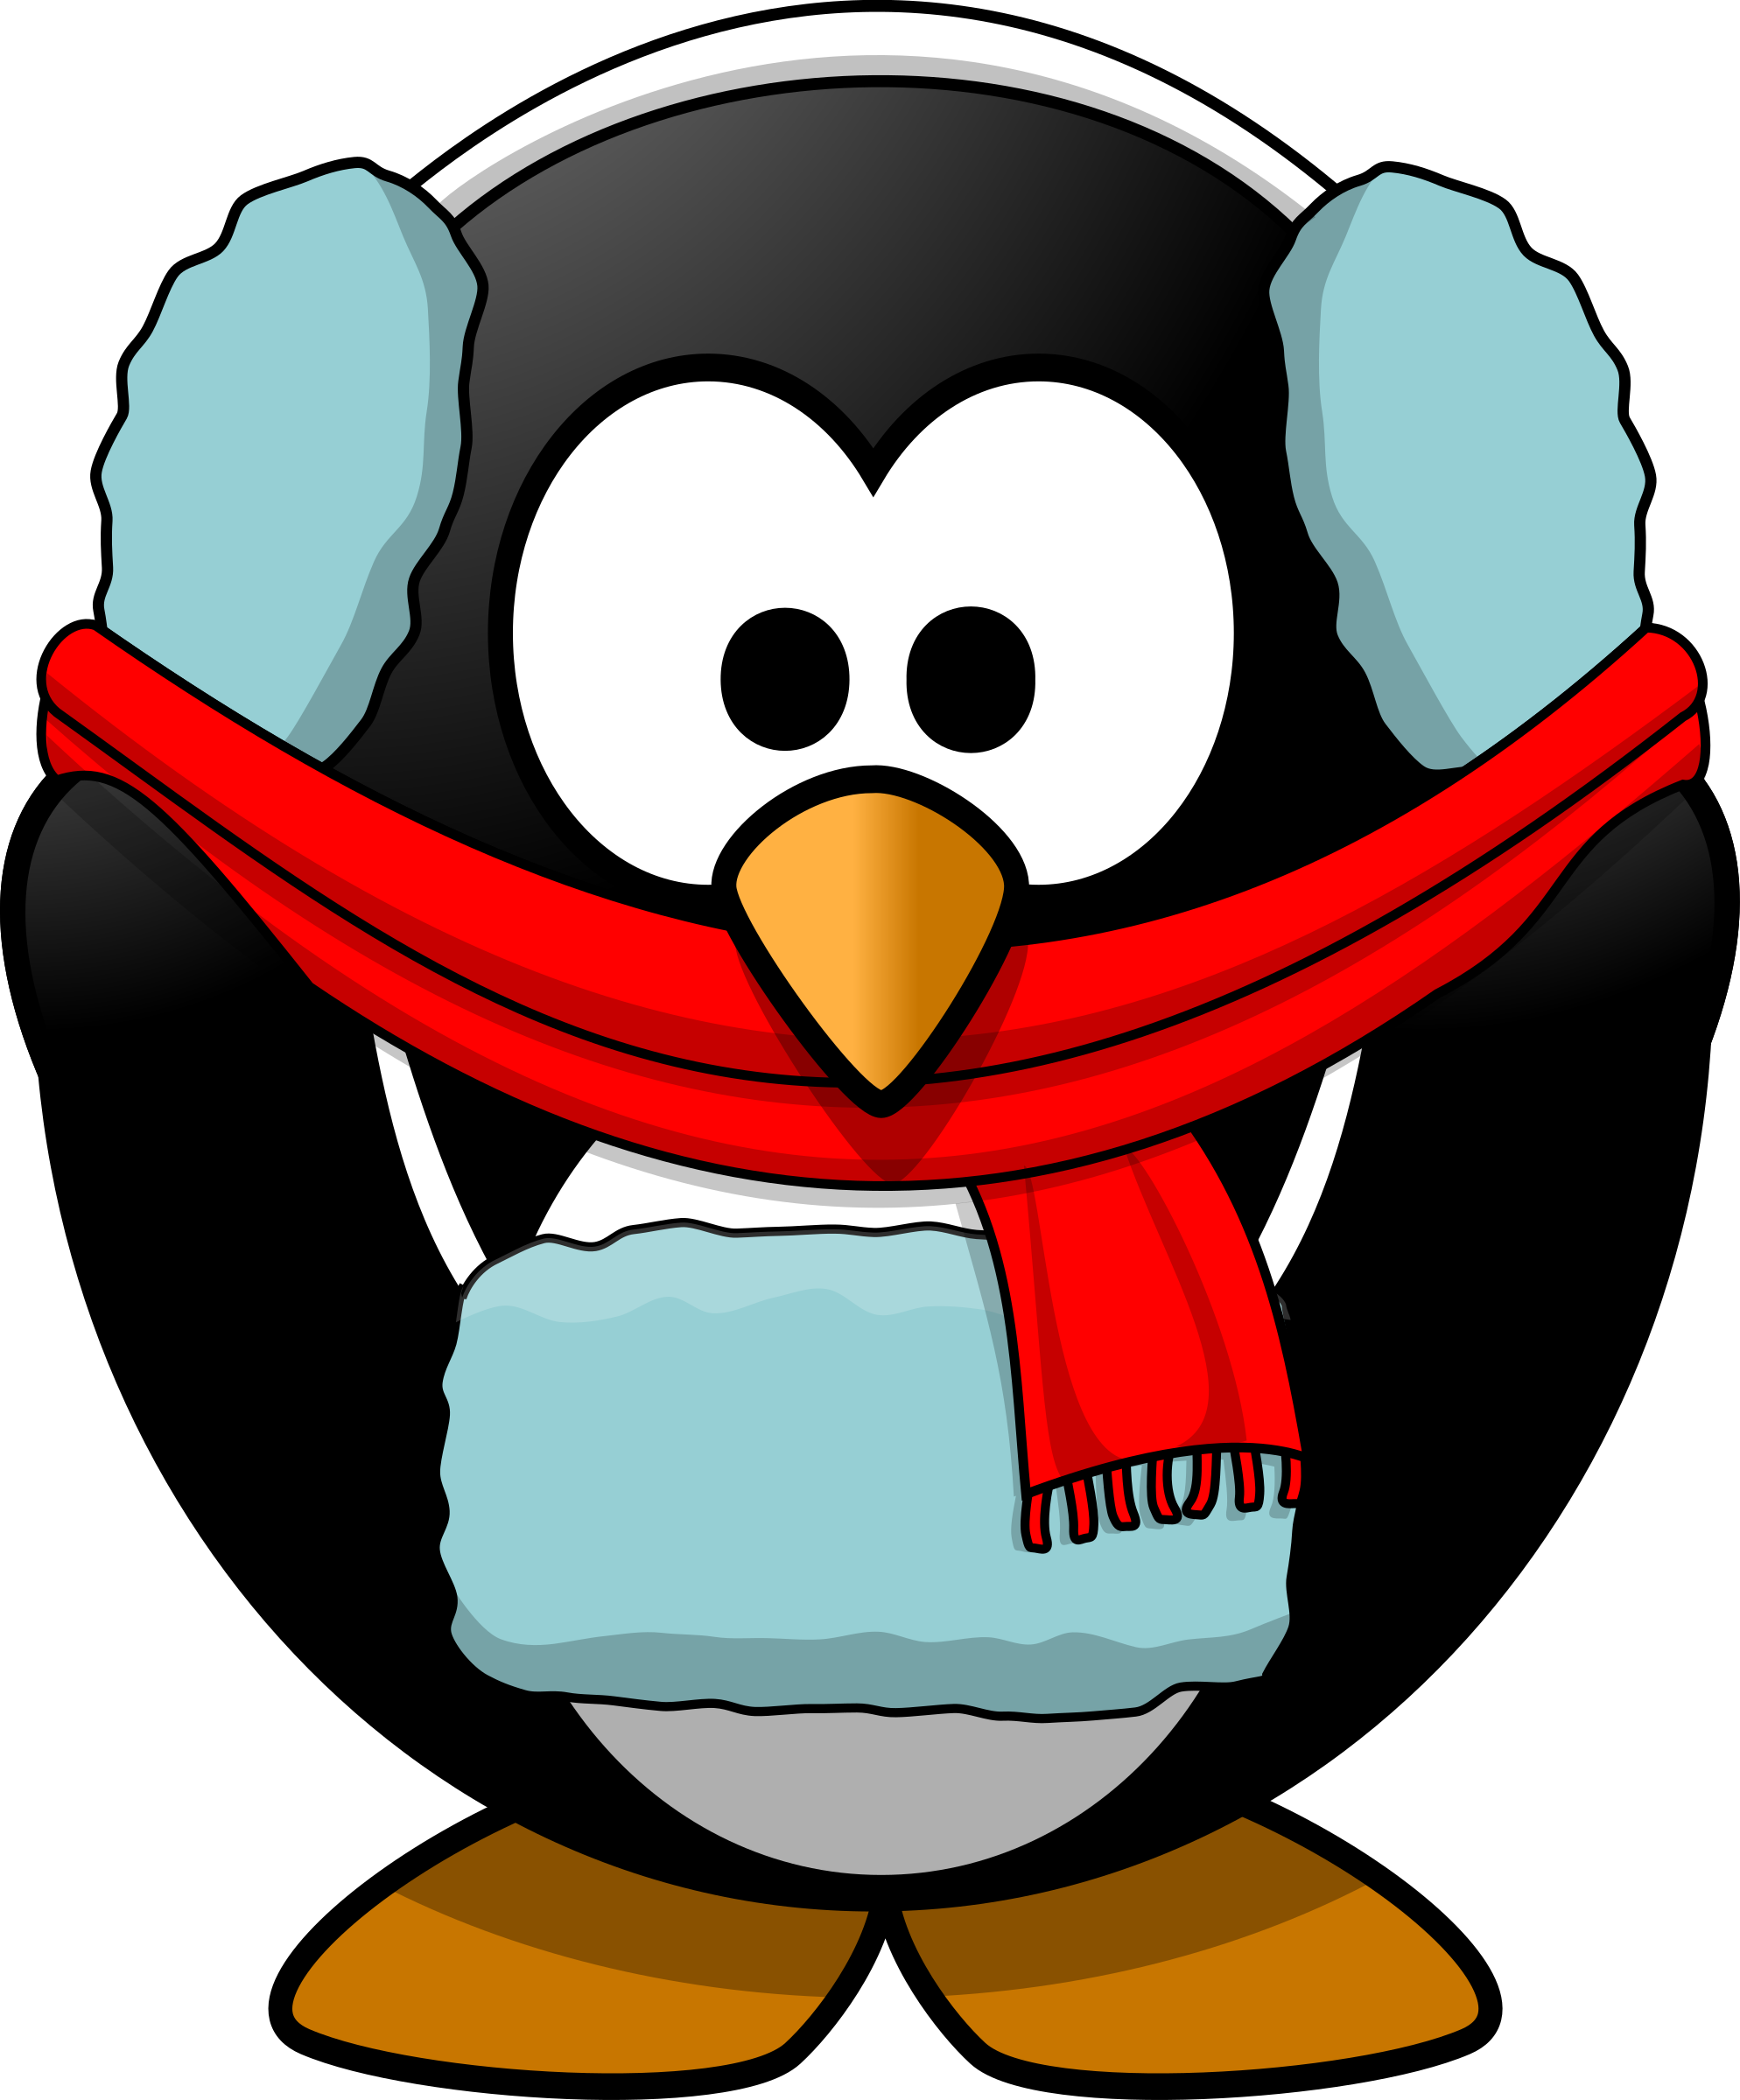 Snow car clipart banner transparent stock Penguin Clipart car - Free Clipart on Dumielauxepices.net banner transparent stock